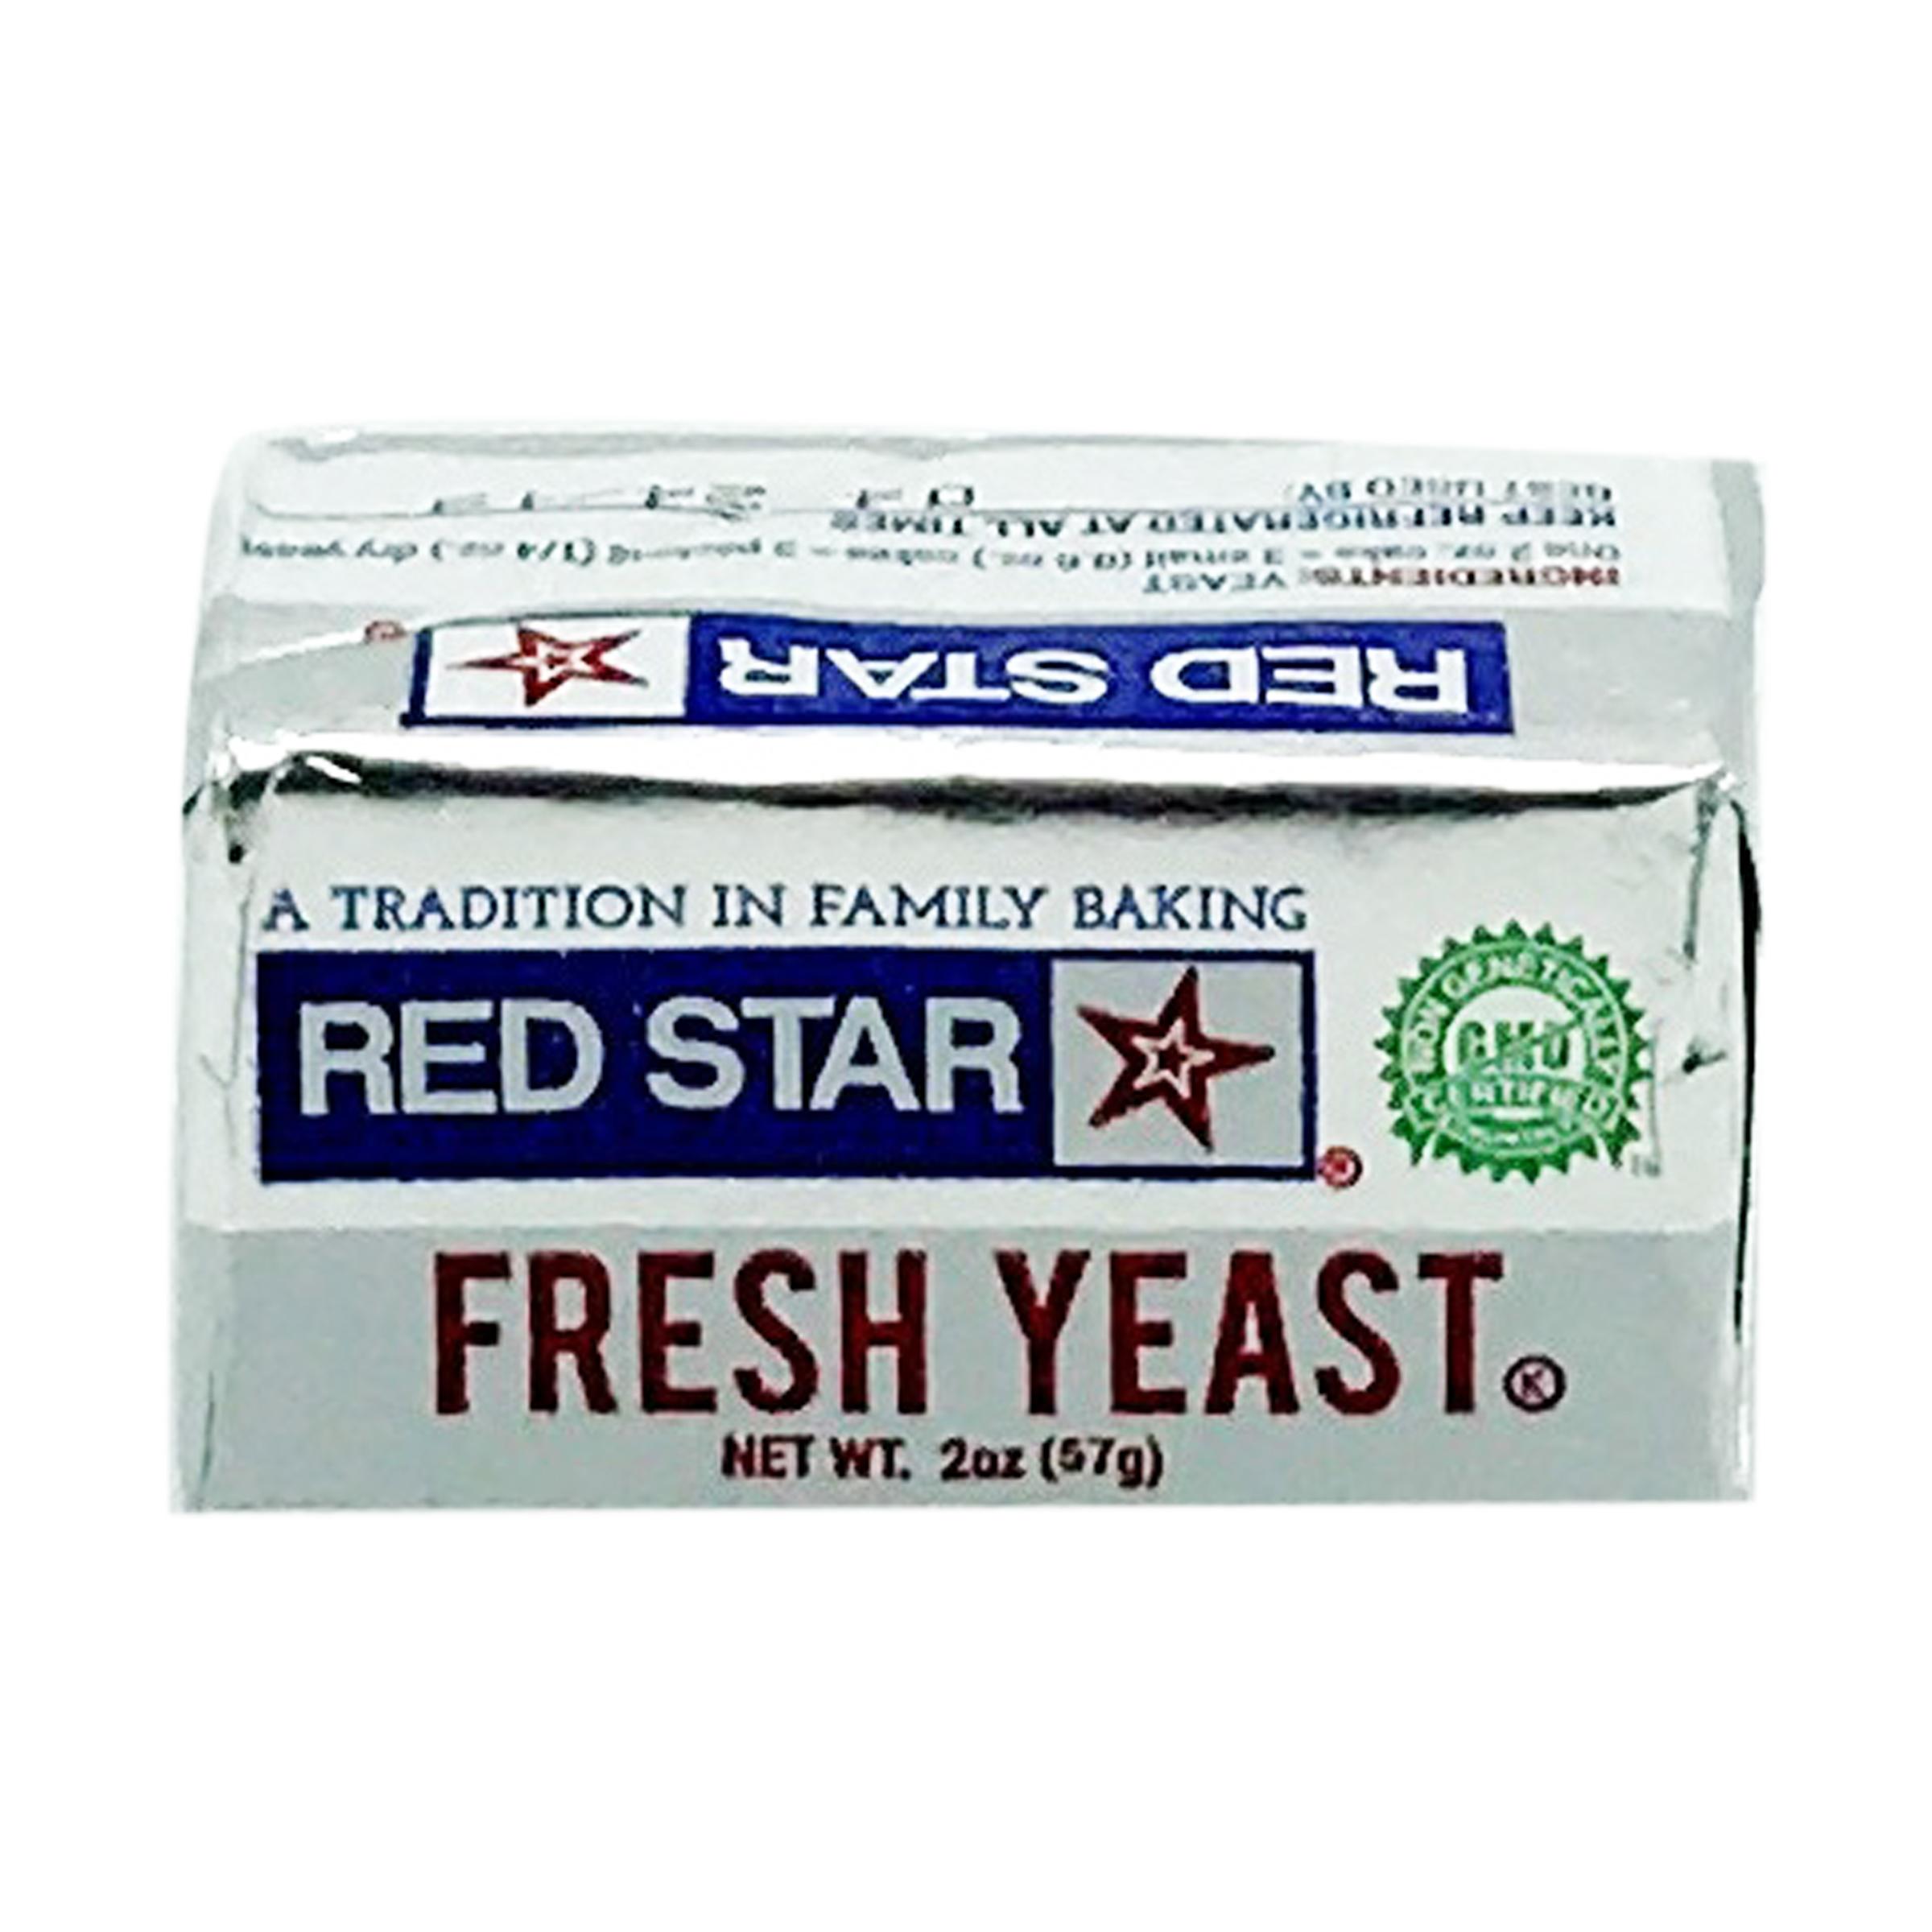 Fresh Yeast 2 Oz Red Star Yeast Whole Foods Market